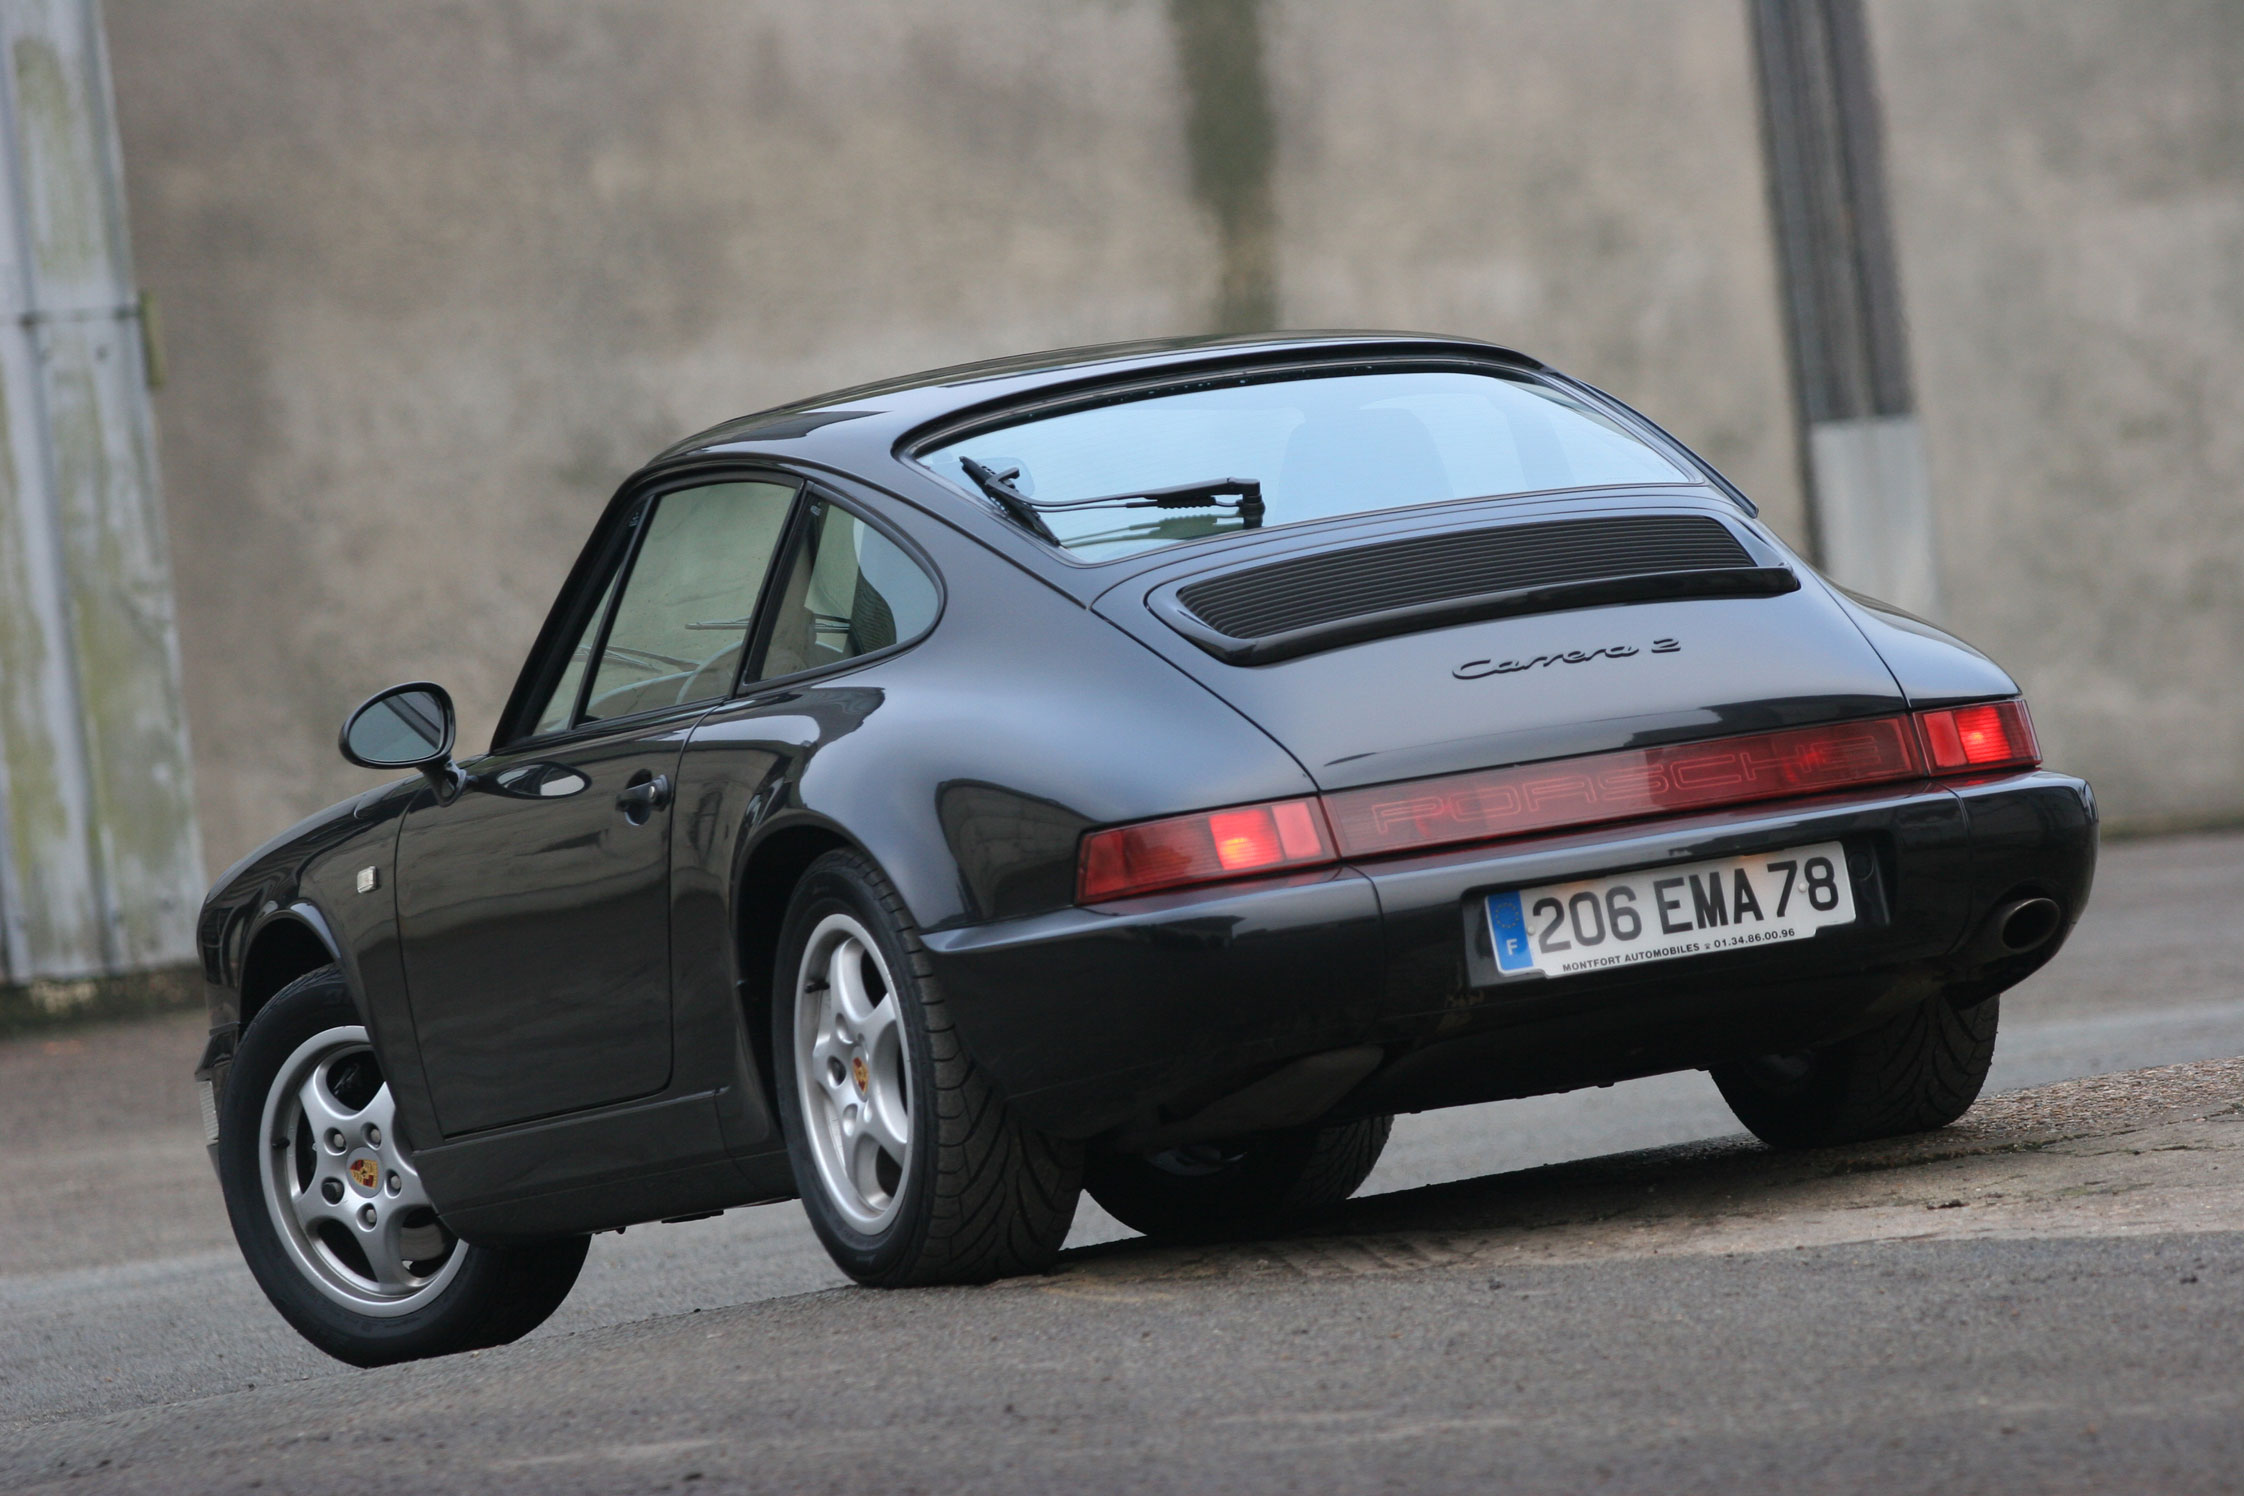 Acheter Une Porsche 911 Carrera 2 Type 964 1990 1993